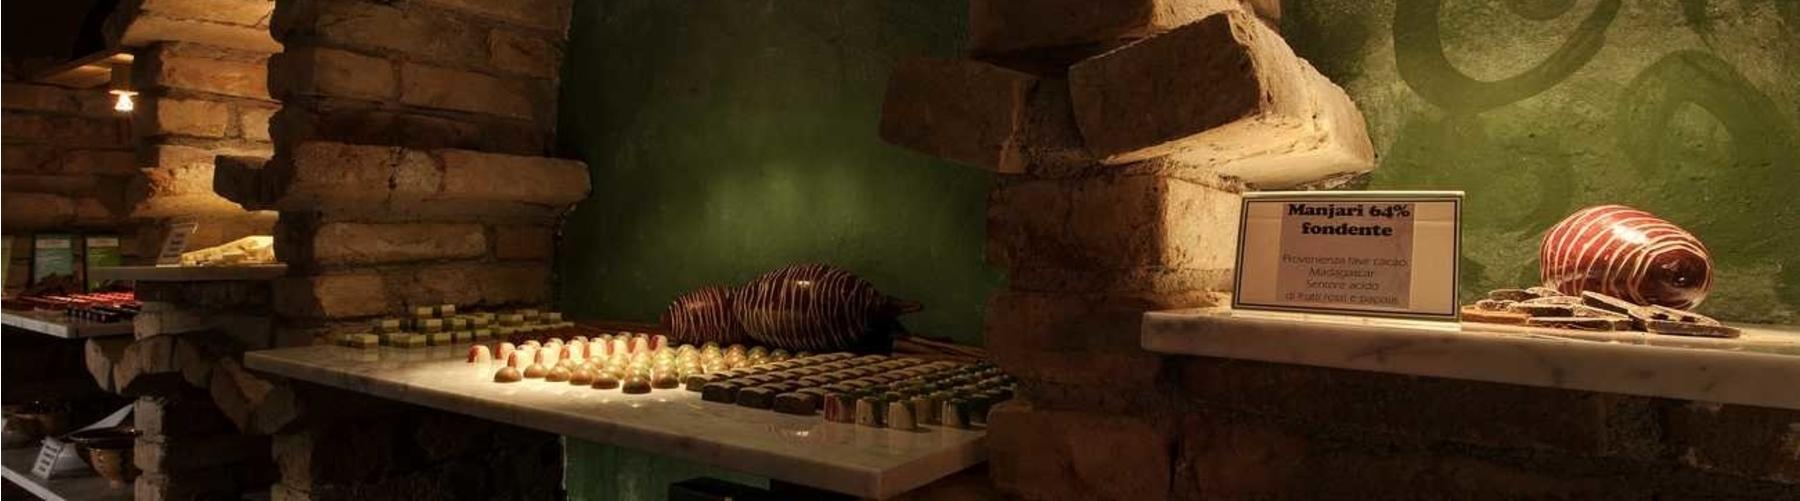 Siasa Salares chocolate room